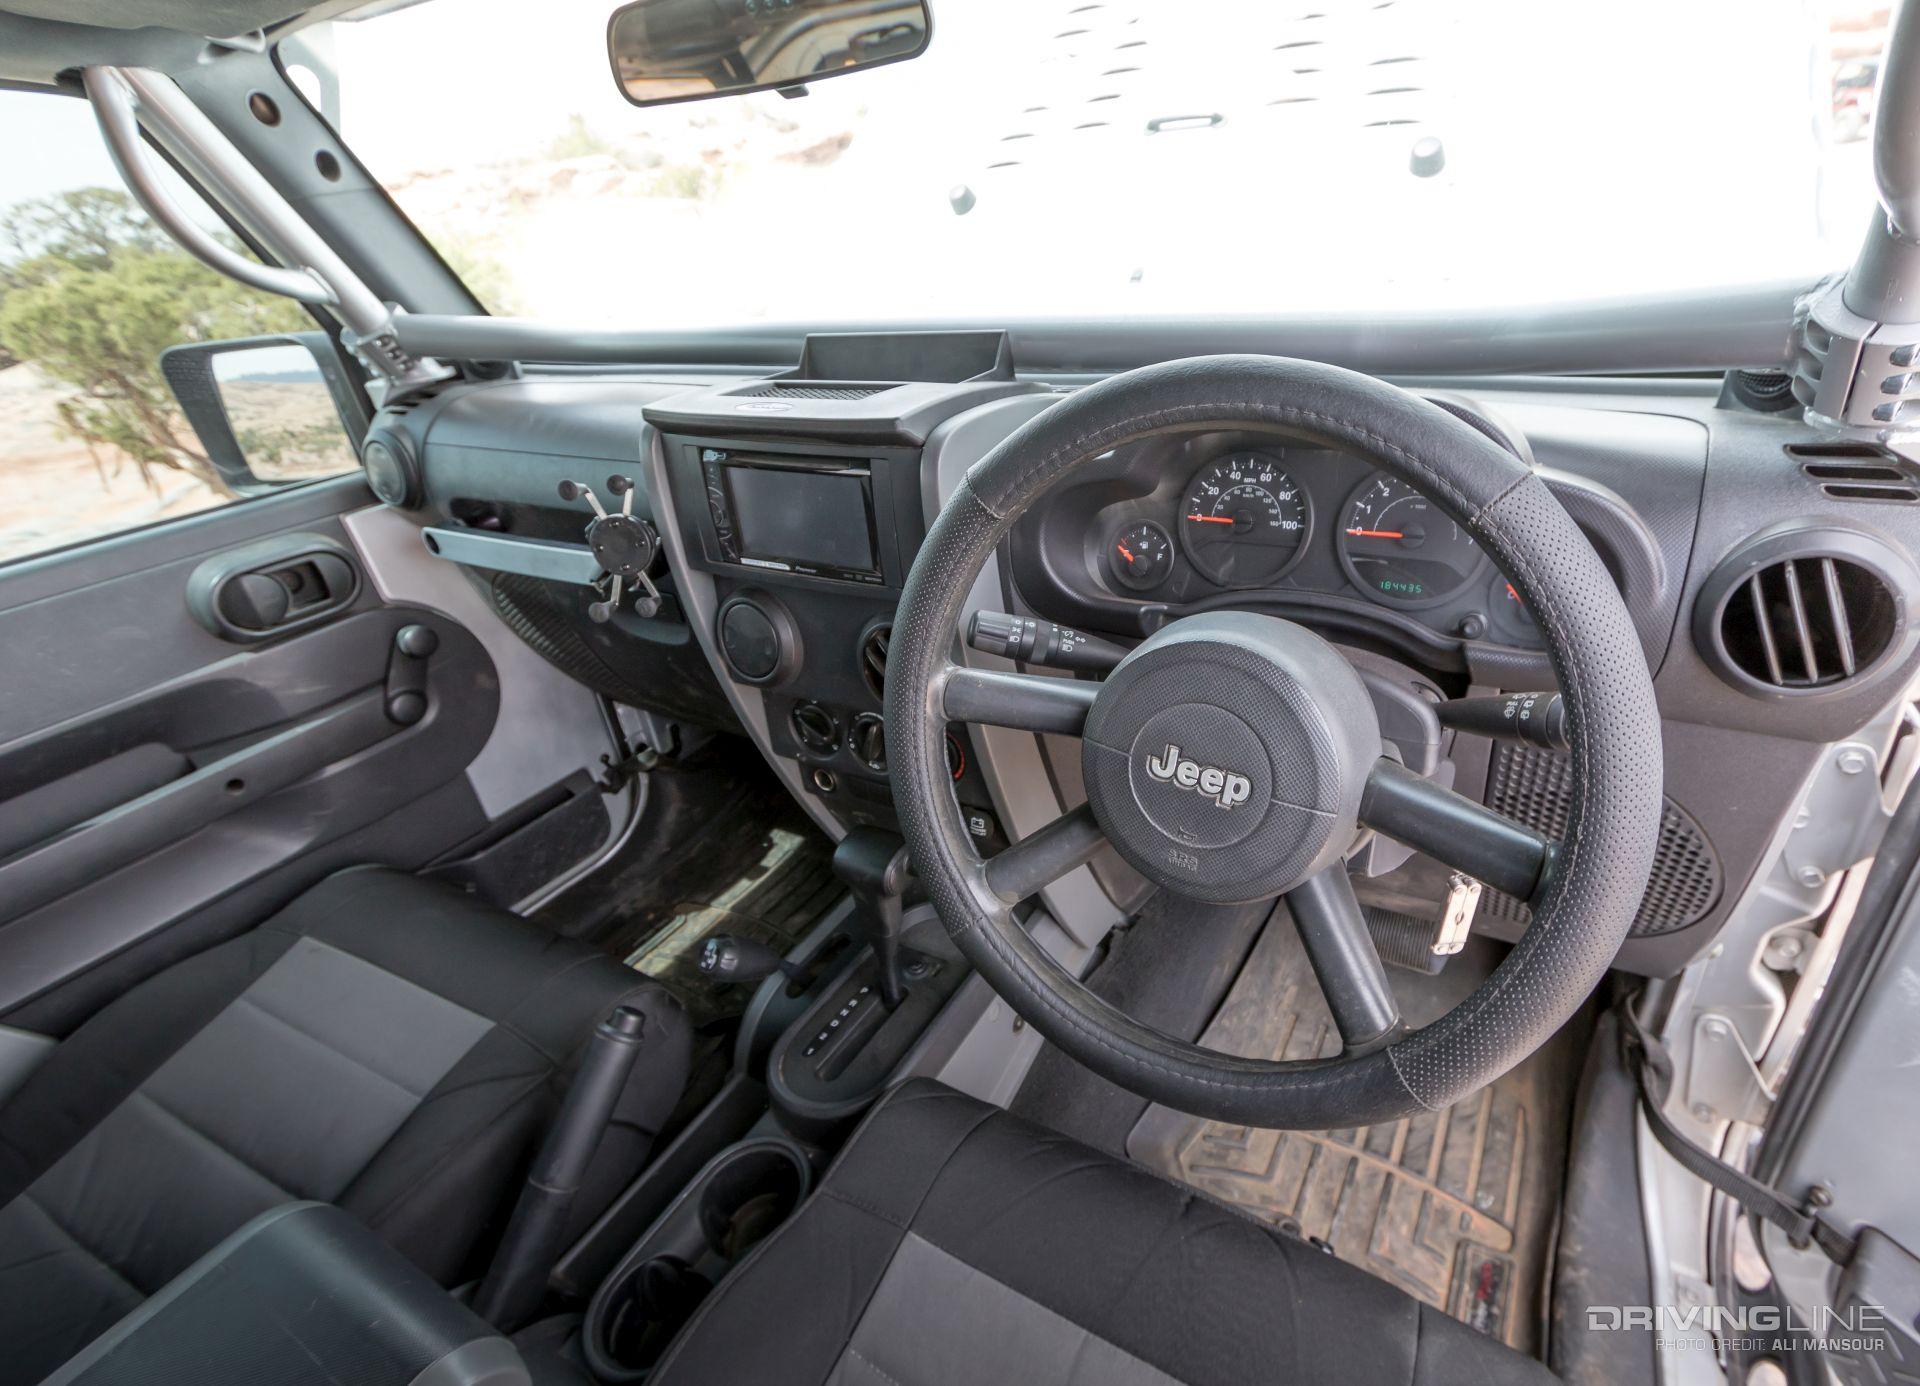 Jeeps of Hazzard A 2008 Jeep Wrangler JK to Go Postal Over